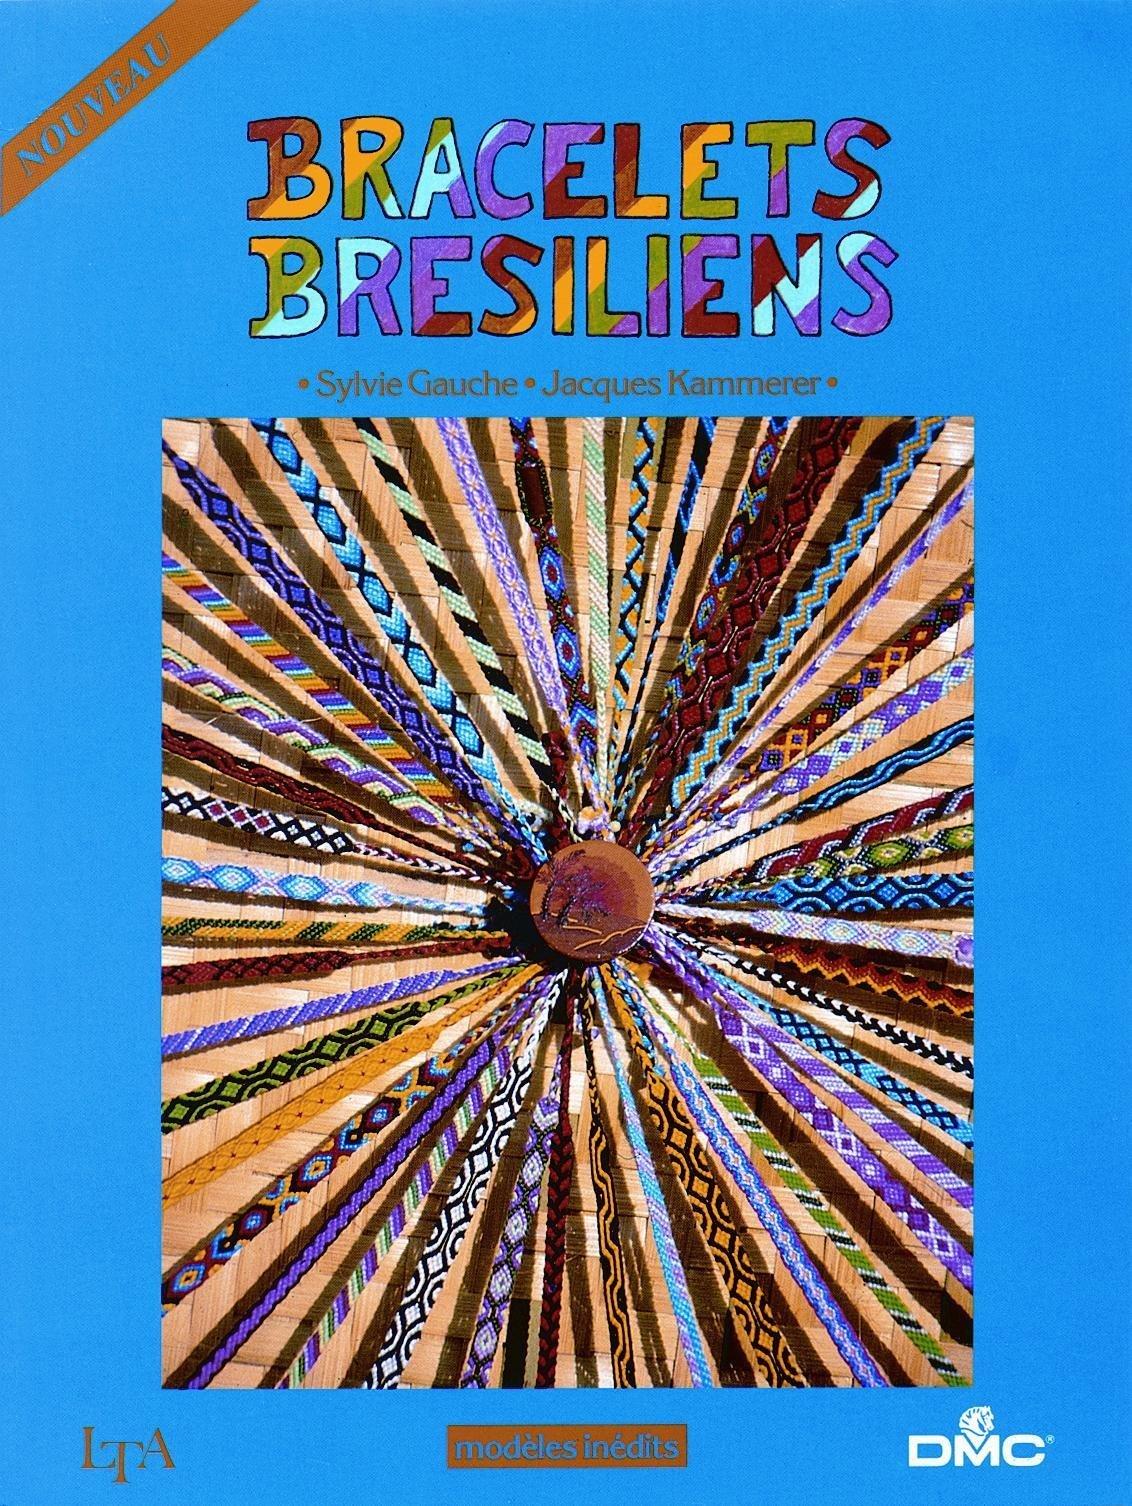 Bracelets Bresiliens Modeles Inedits Gauche Sylvie Kammerer Jacques 9782283580356 Amazon Com Books